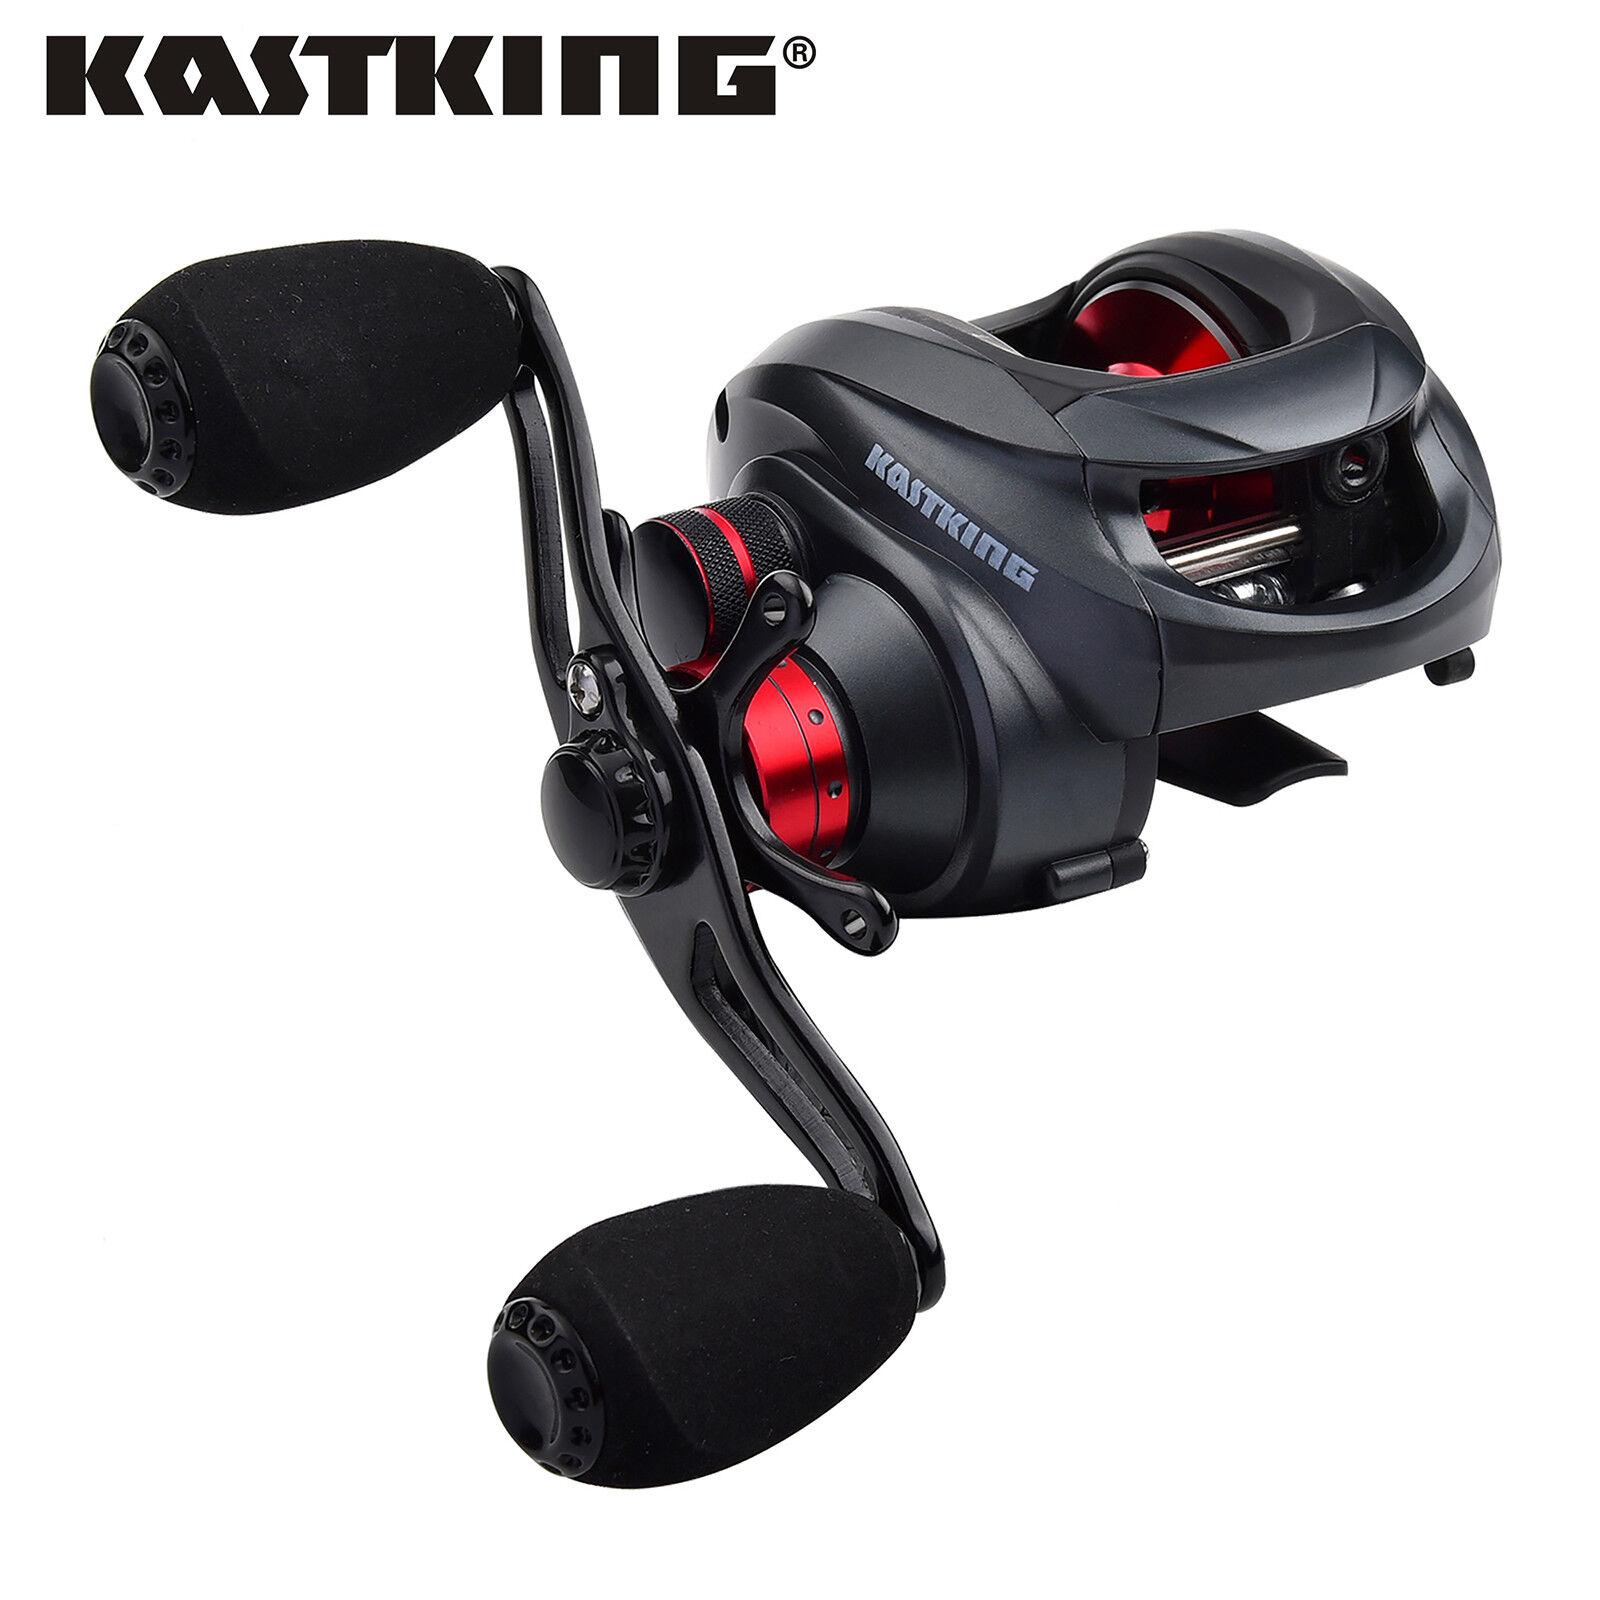 KastKing Spartacus Low Profile Baitcasting Reel  Carp Pike Fishing Baitcaster